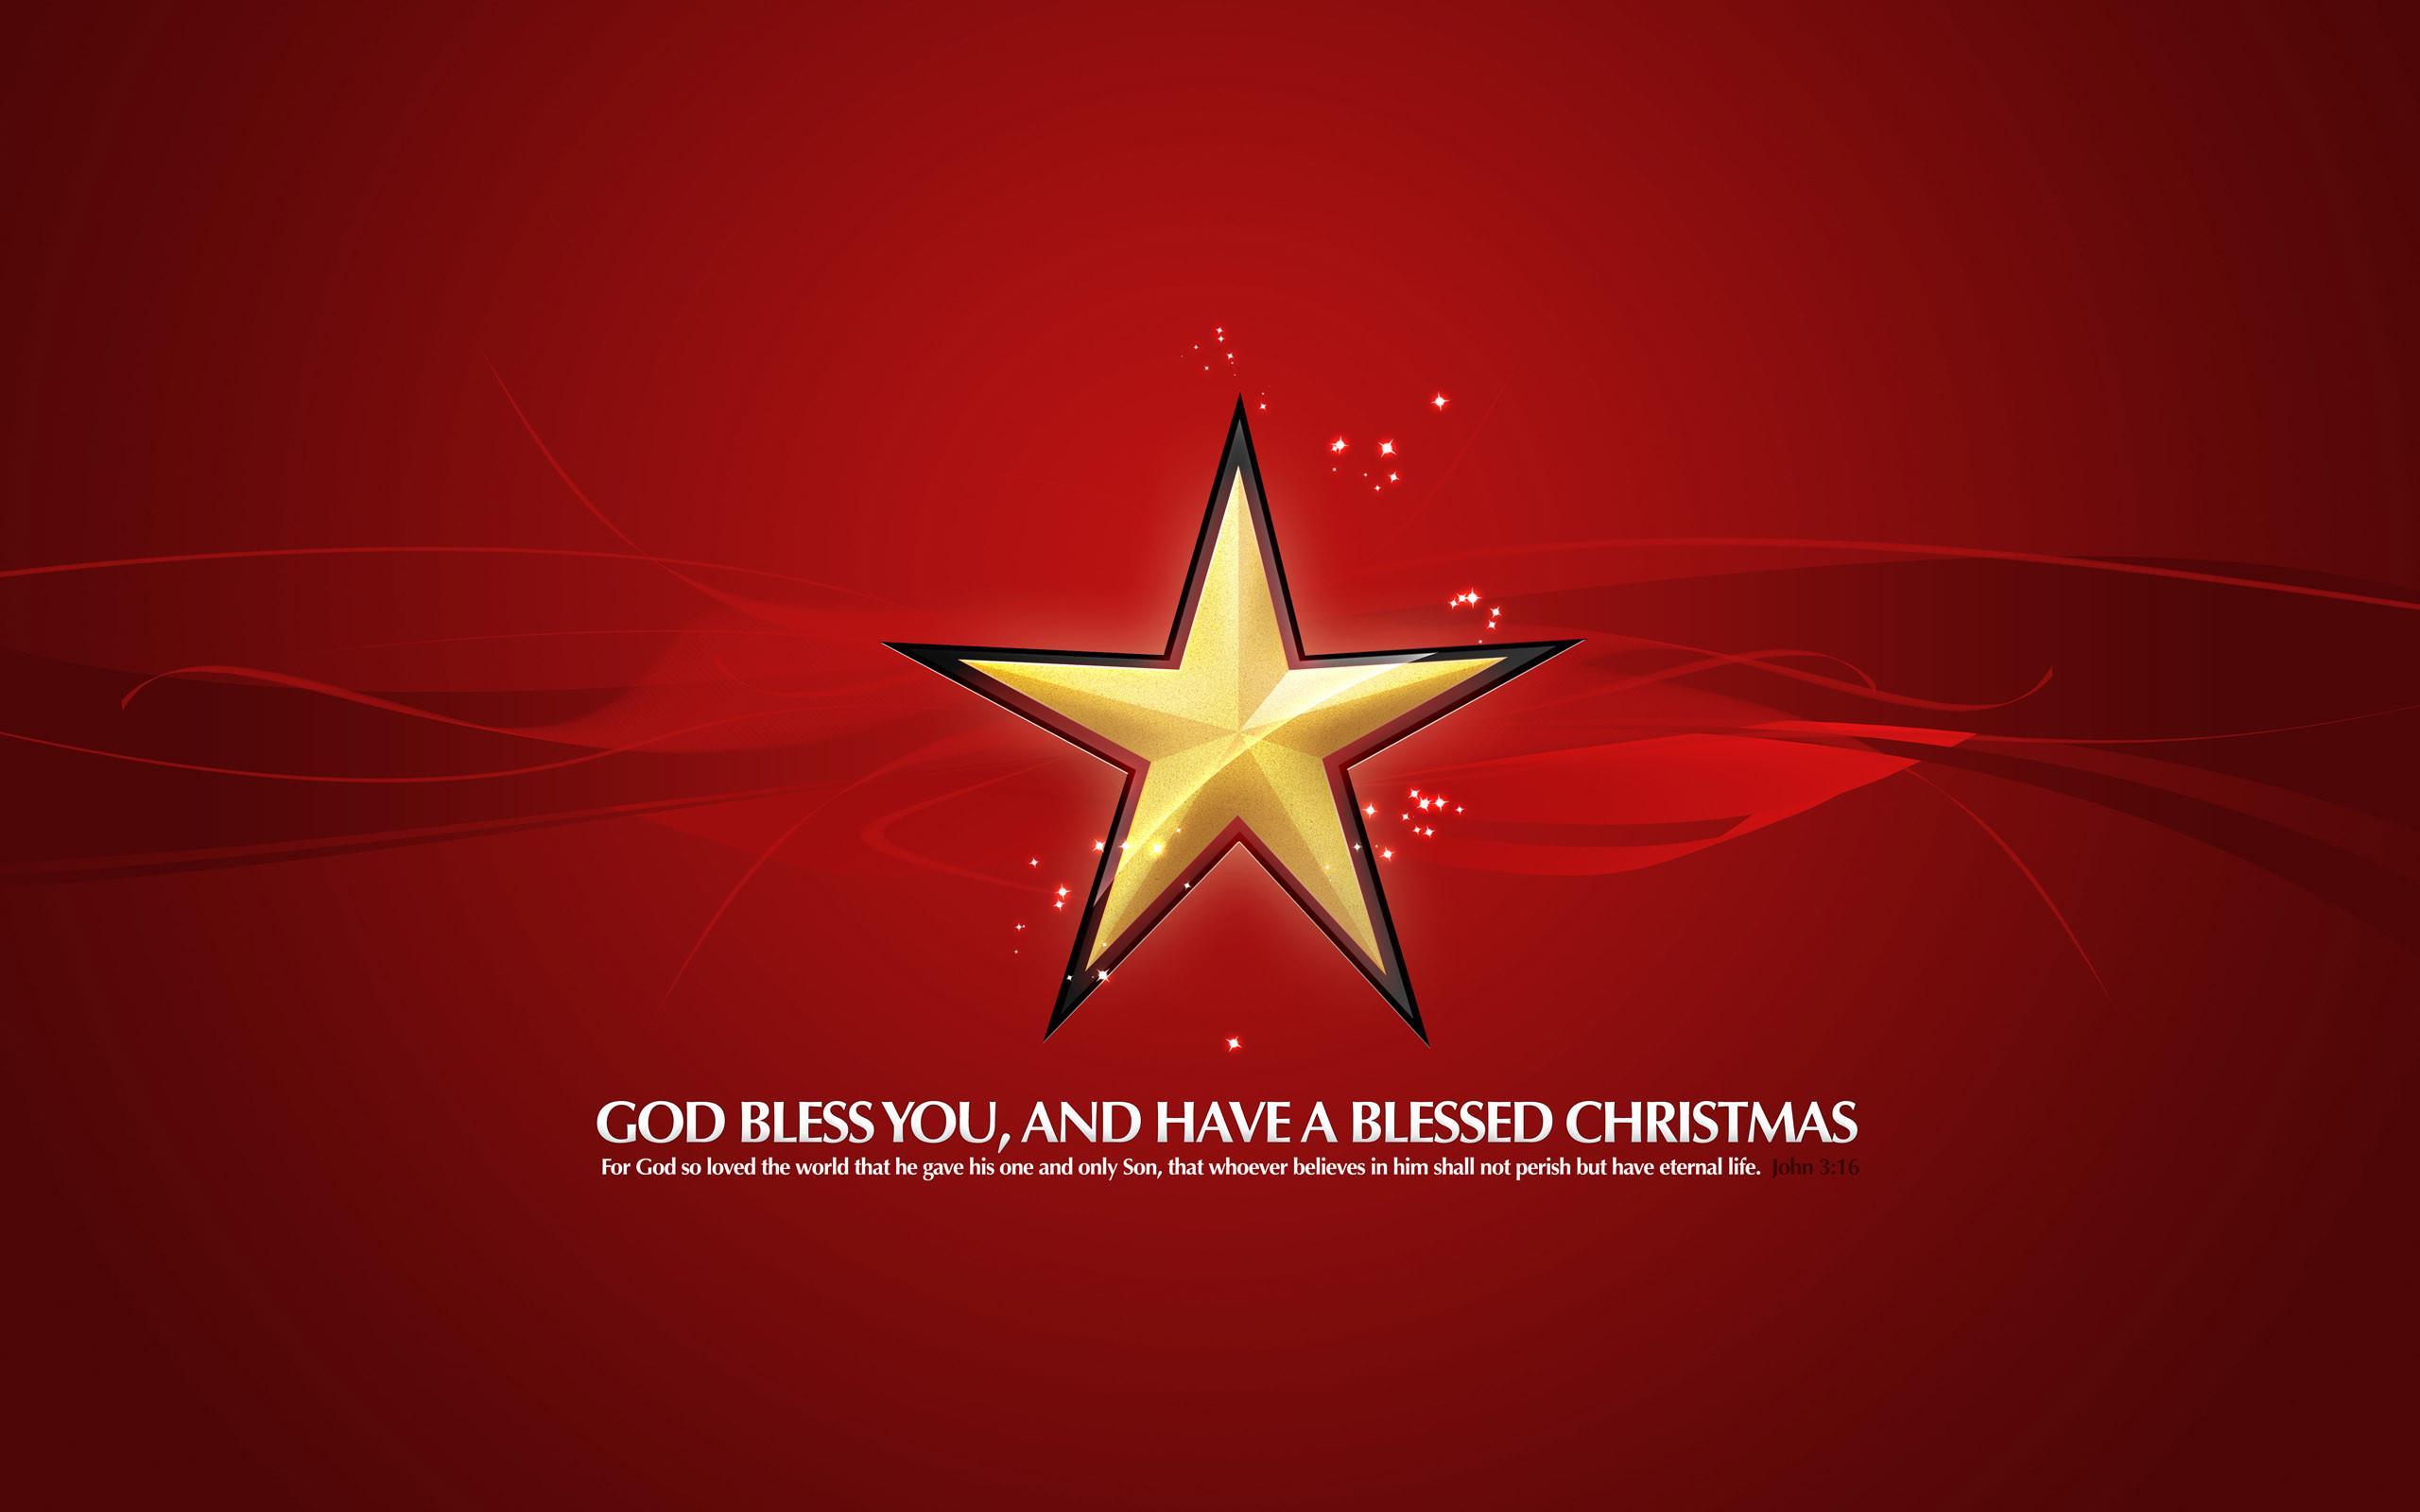 Free Christmas Golden Star HD Wallpaper For Desktop